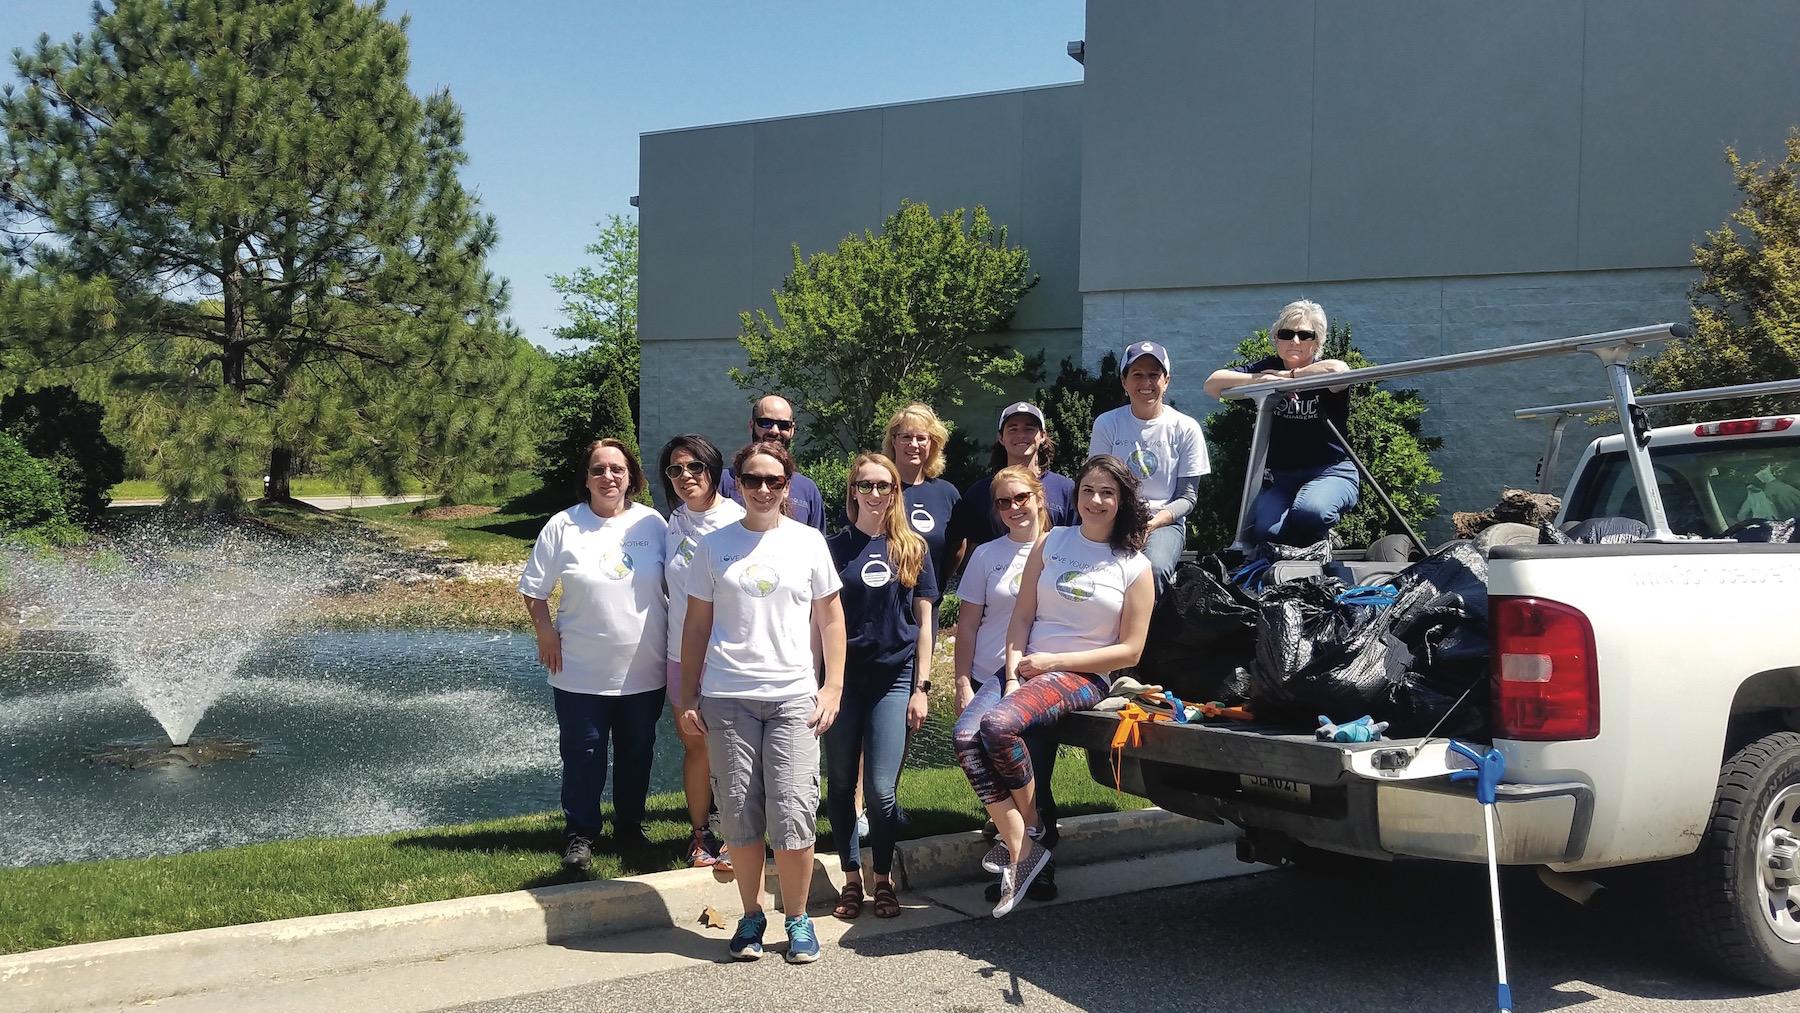 SOLitude Lake Management, Virginia Beach, Hampton Roads, Community Impact Awards, business making a difference